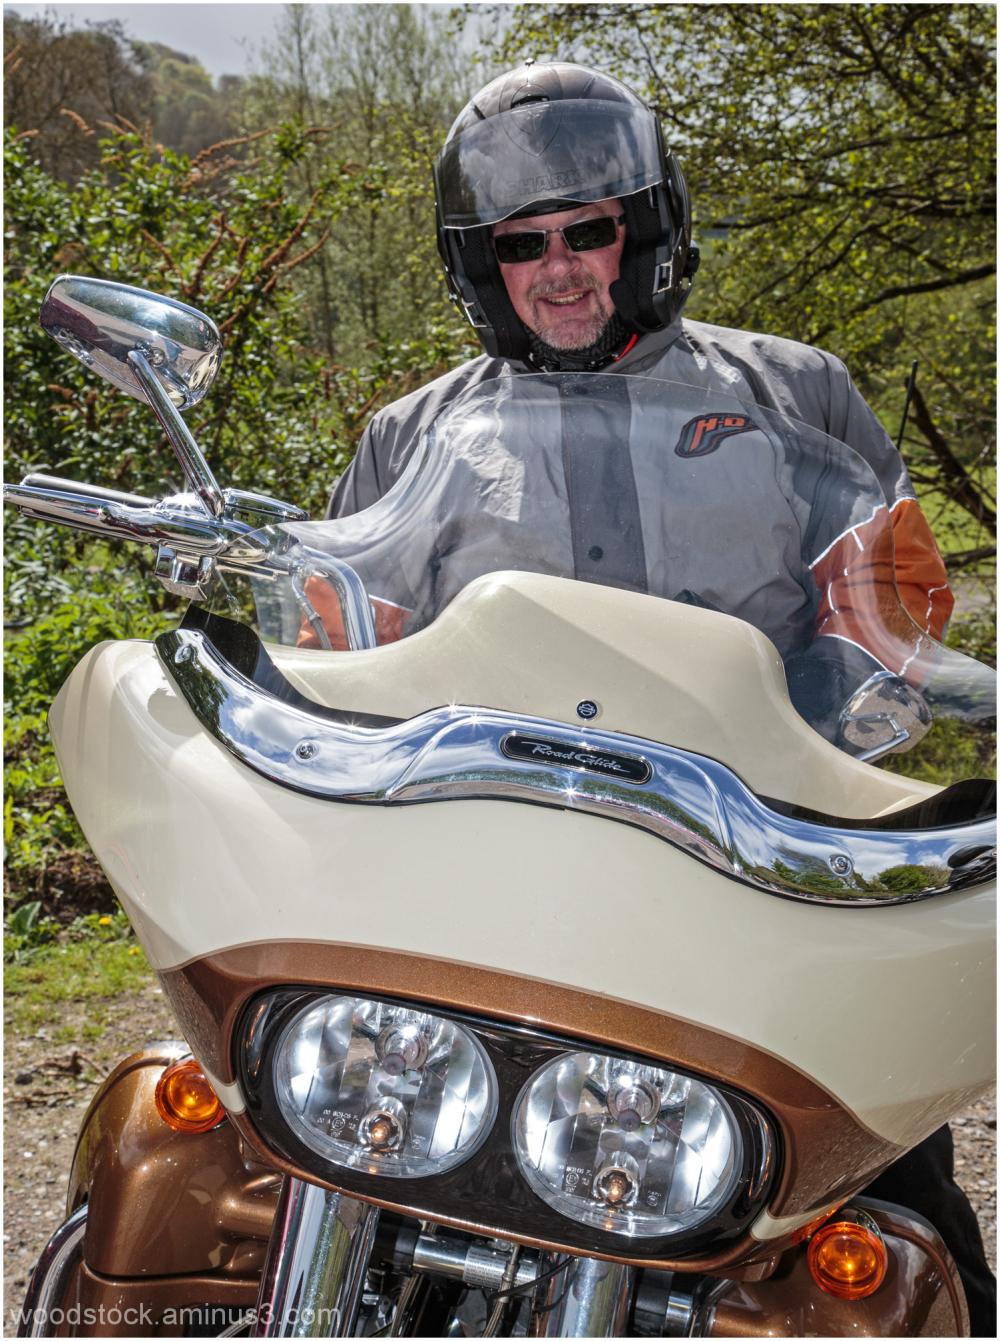 Harley Owner 4